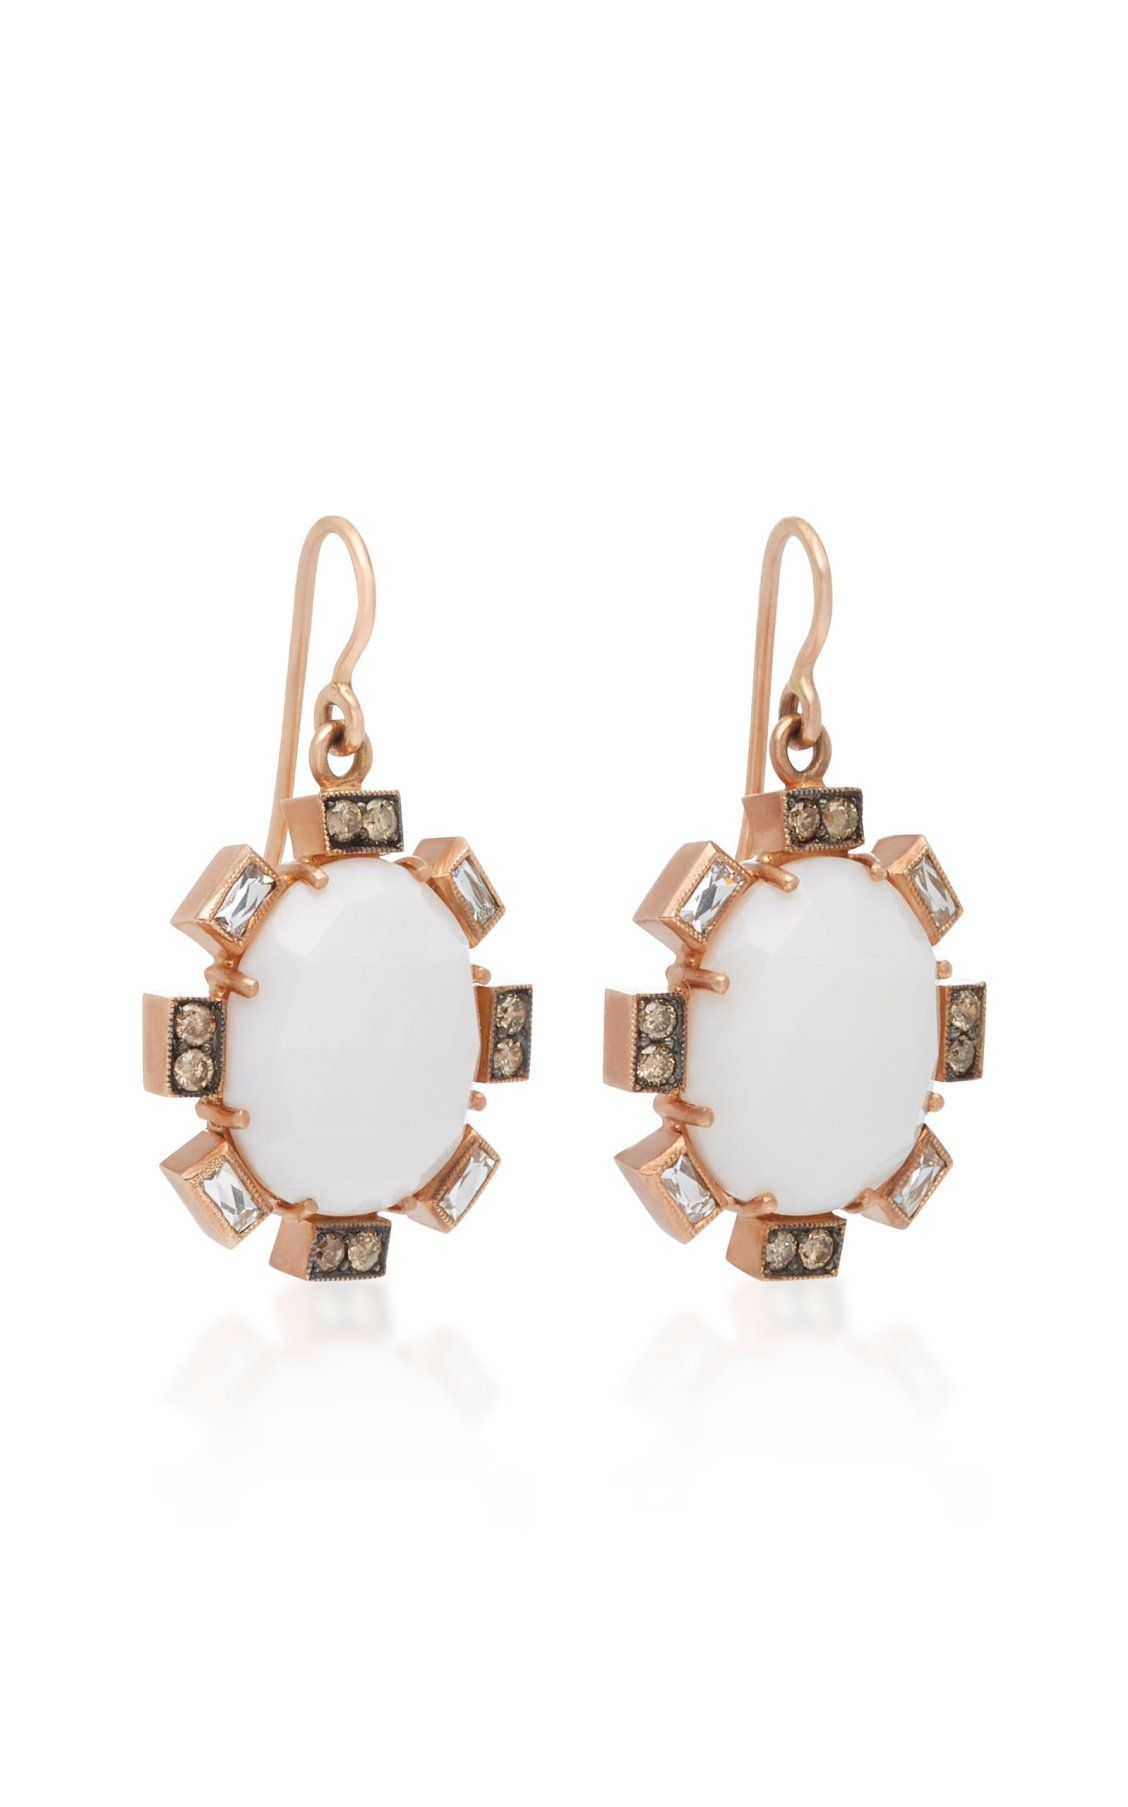 14K Rose Gold Cocholong and Diamond Earrings Sylva & Cie. olqTxe1